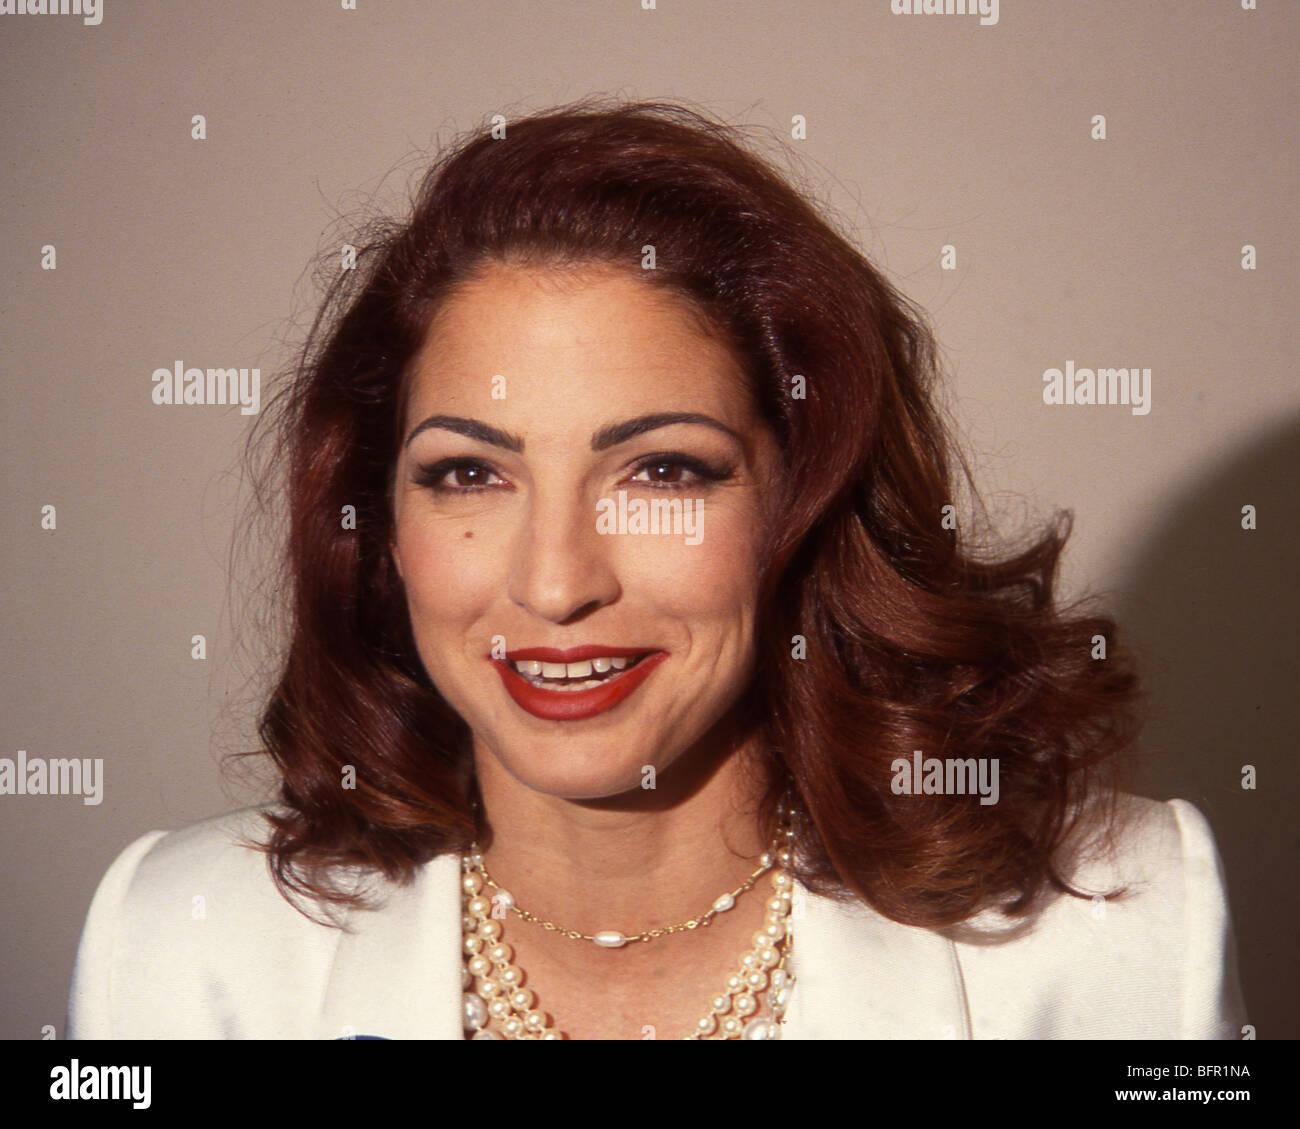 GLORIA ESTEFAN - US Latin American singer in 1993 - Stock Image